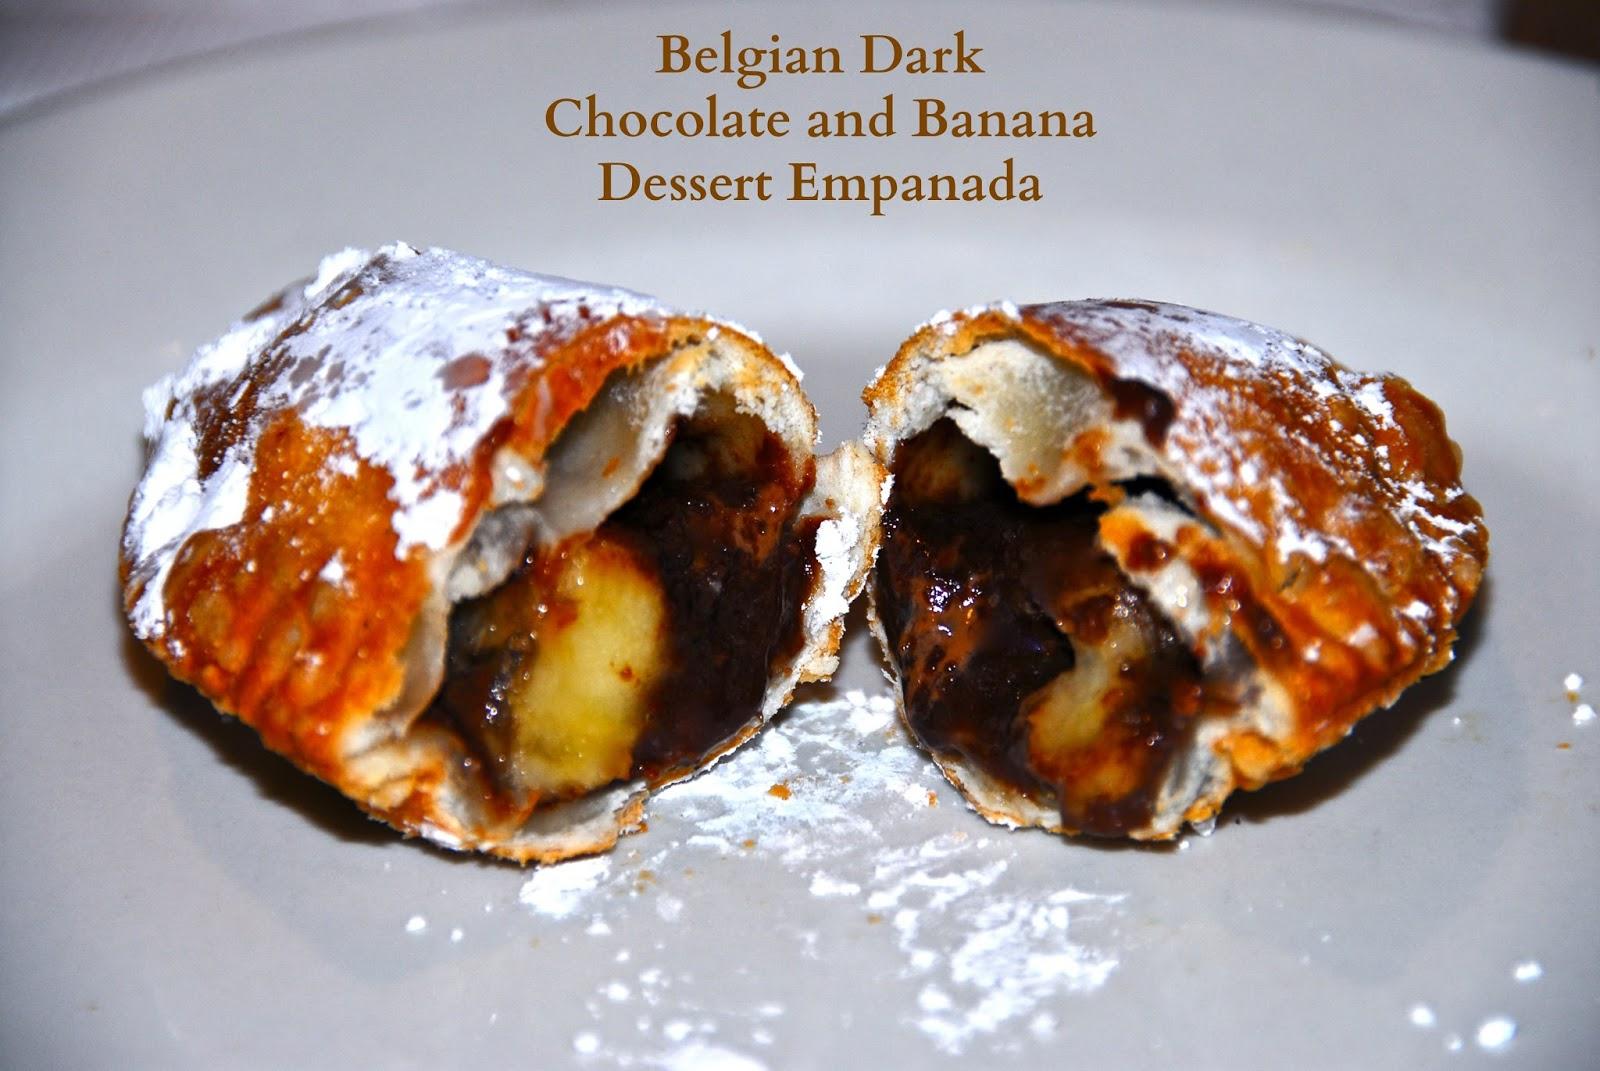 trip over dessert